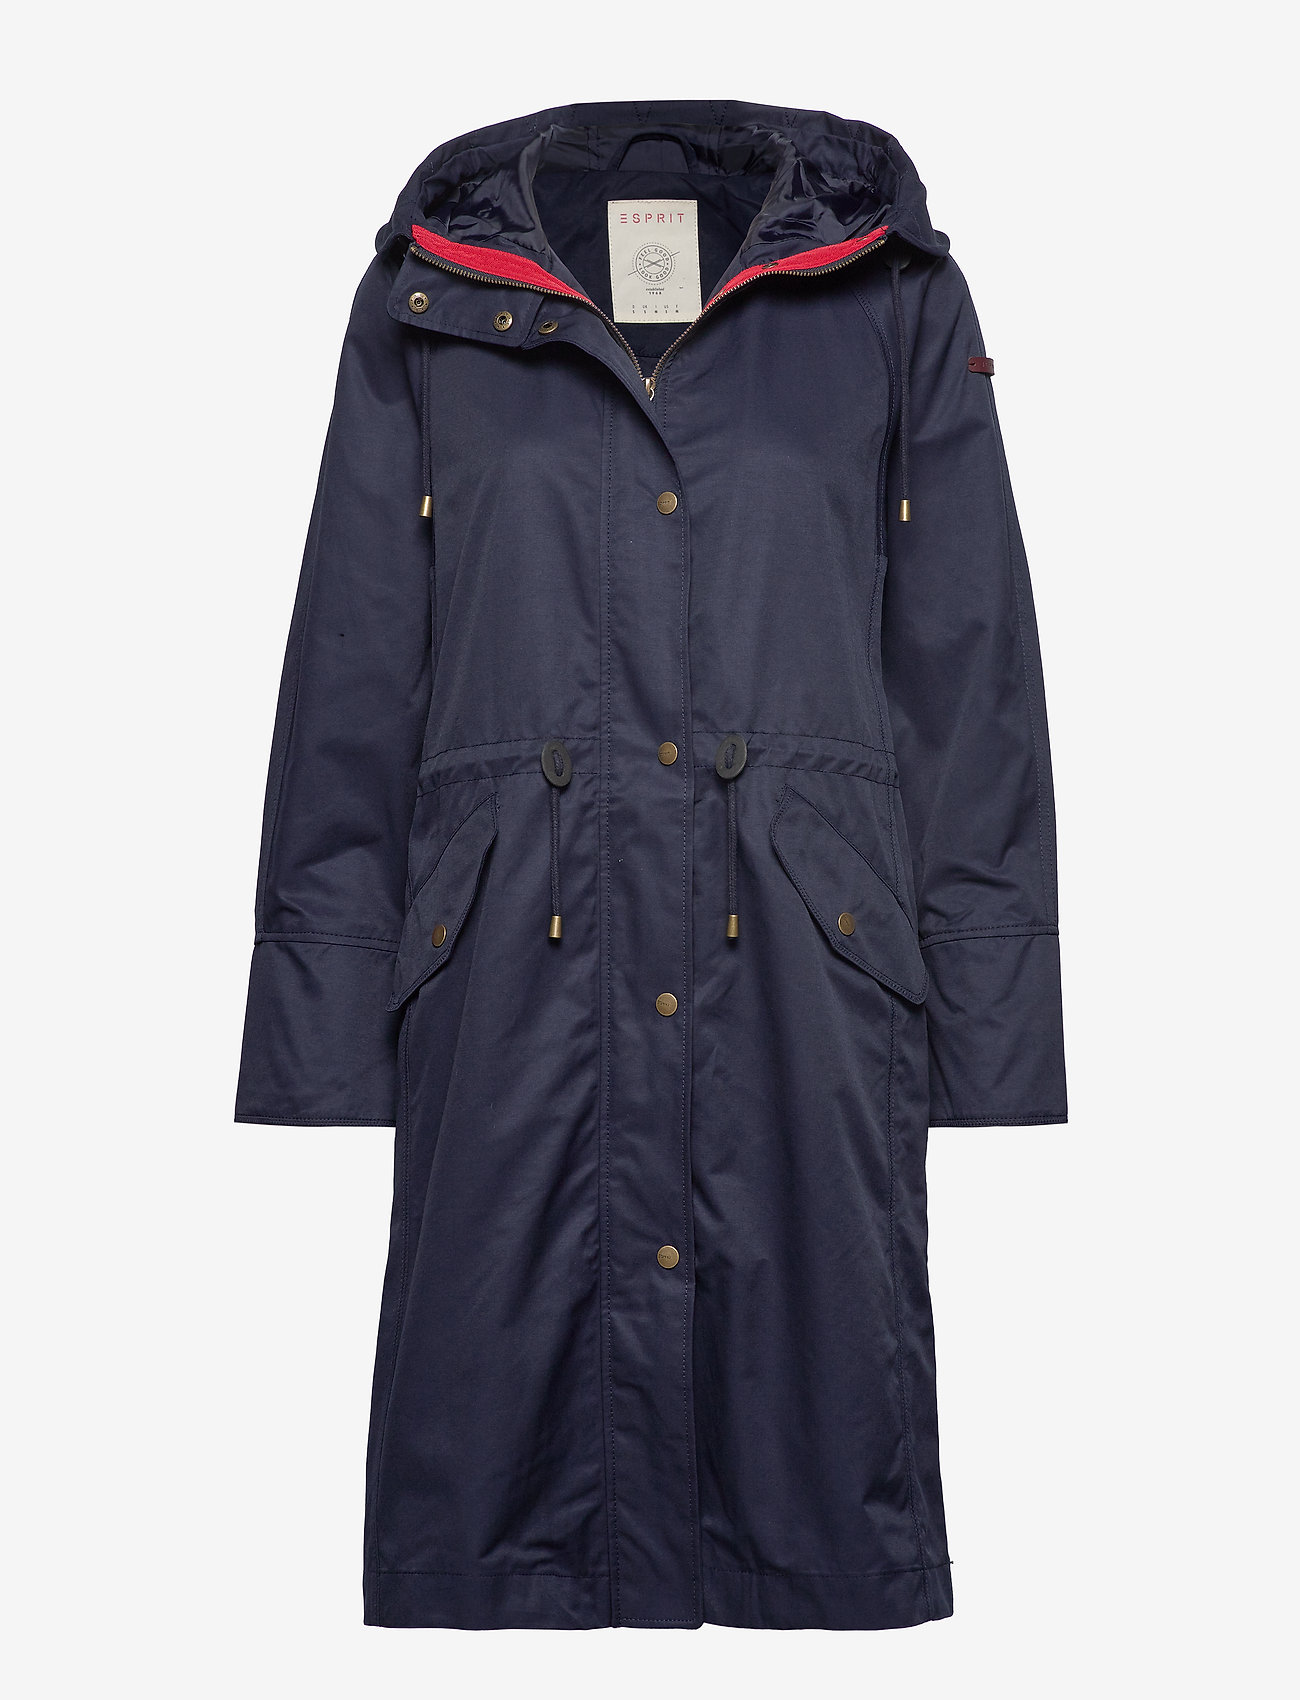 Esprit Casual - Coats woven - cienkie płaszcze - navy - 0